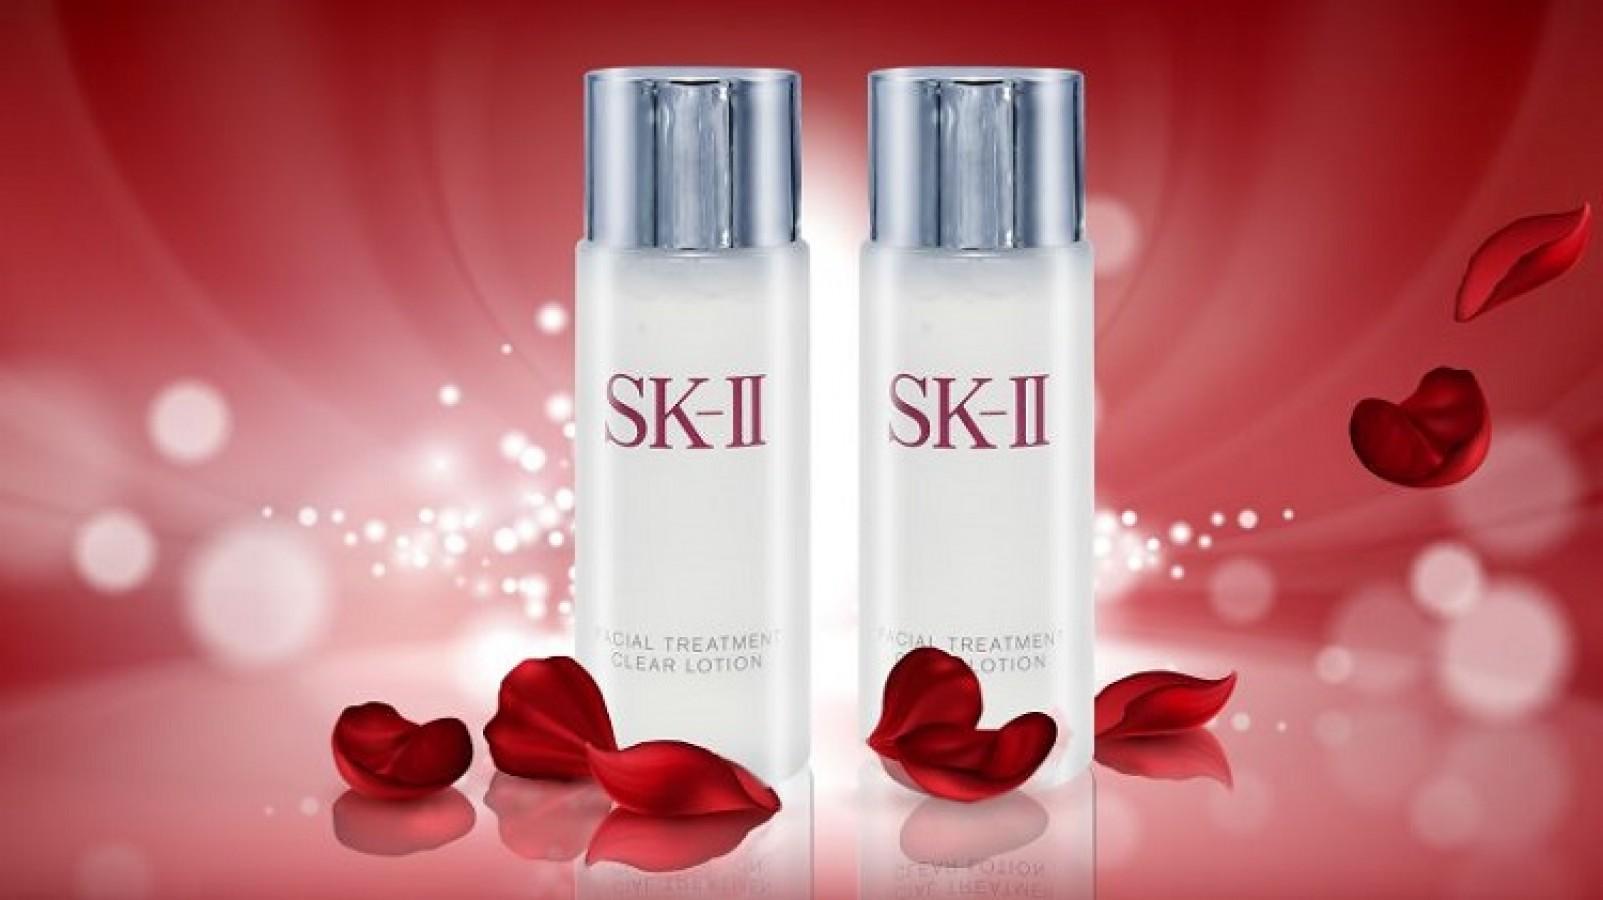 Nước Hoa Hồng SK II Facial Treatment Clear Lotion 30ml